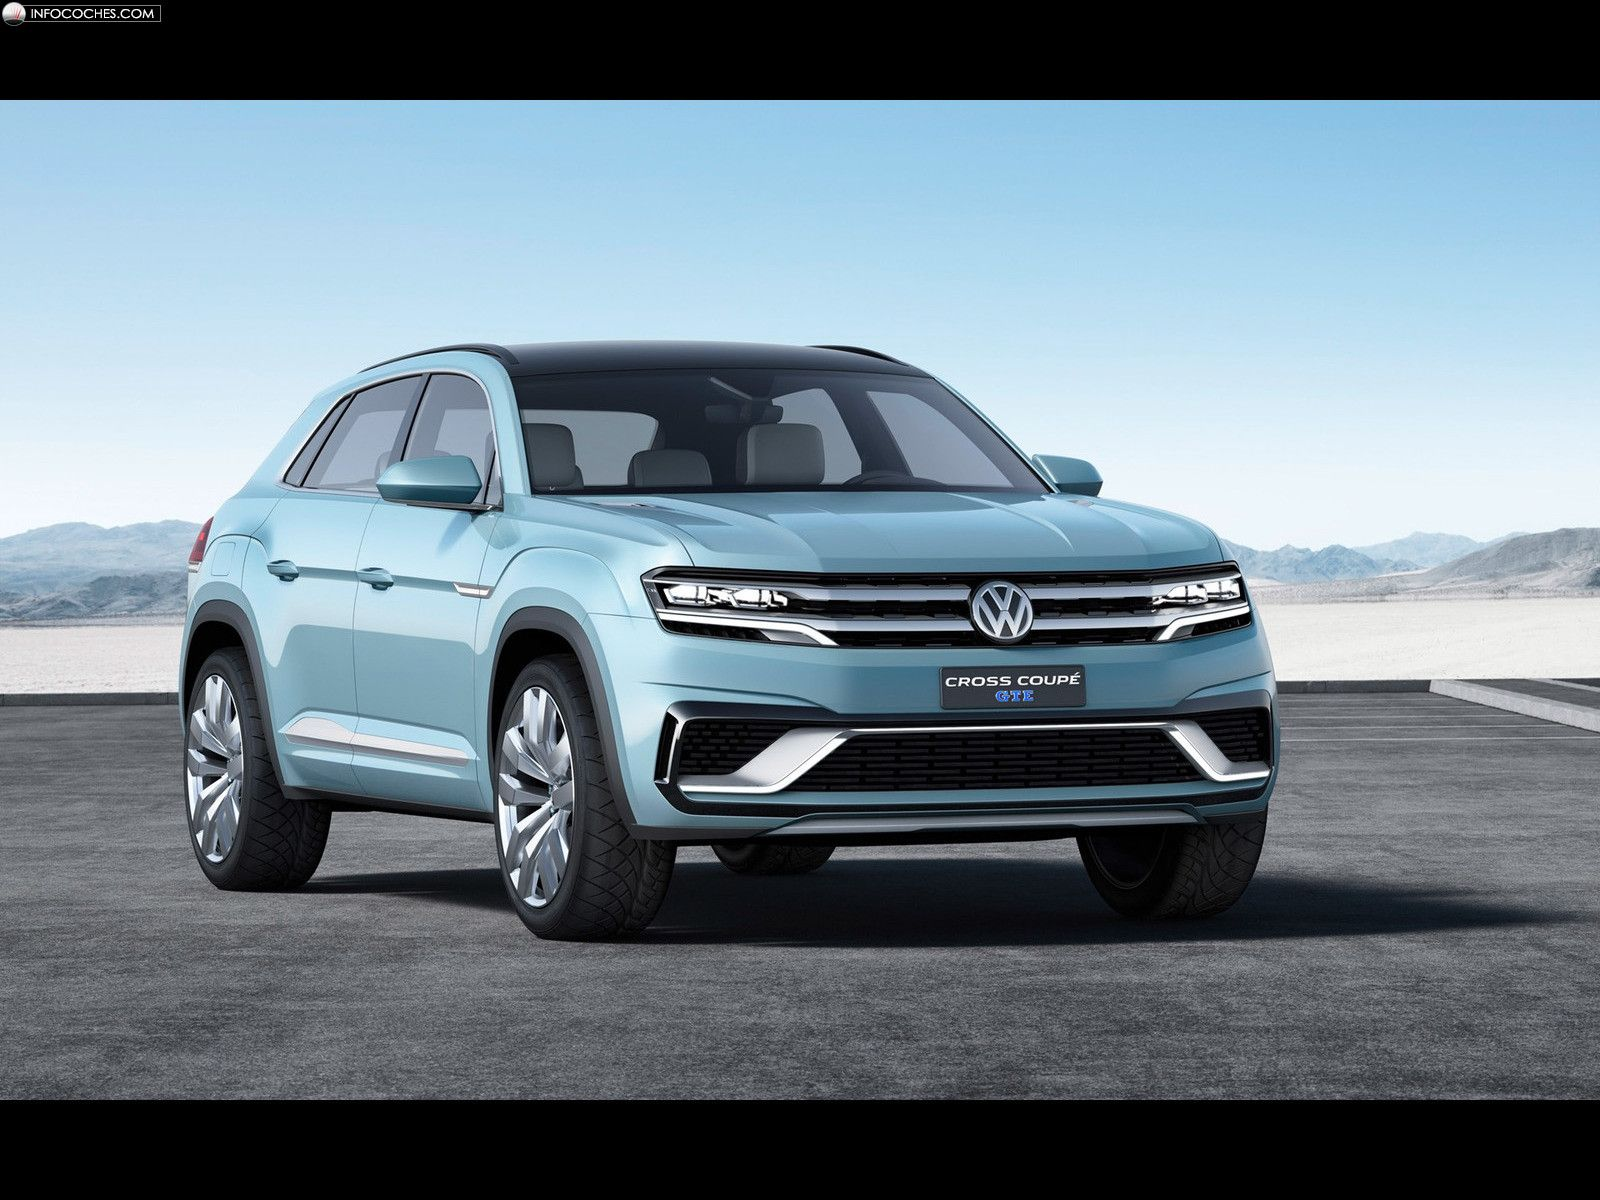 Fotos del Volkswagen Cross Coupe GTE Concept - 8 / 15